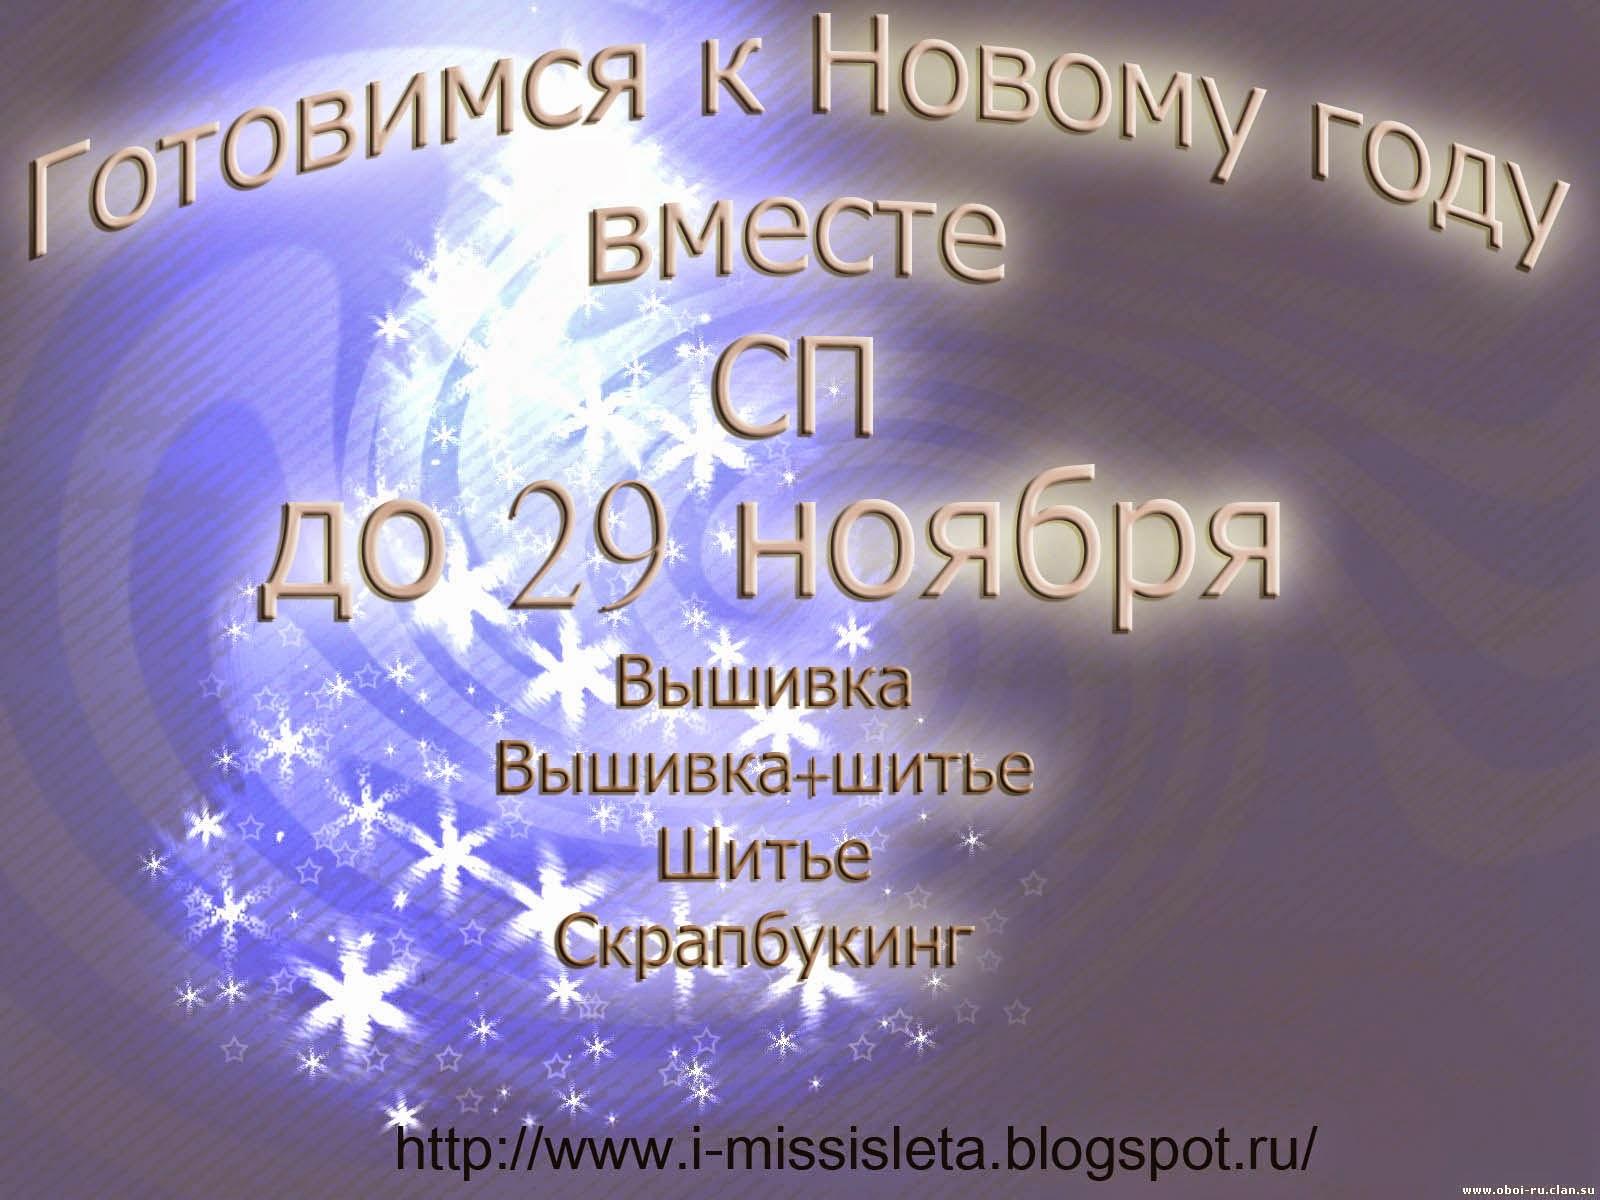 Новогодний СП до 29 ноября